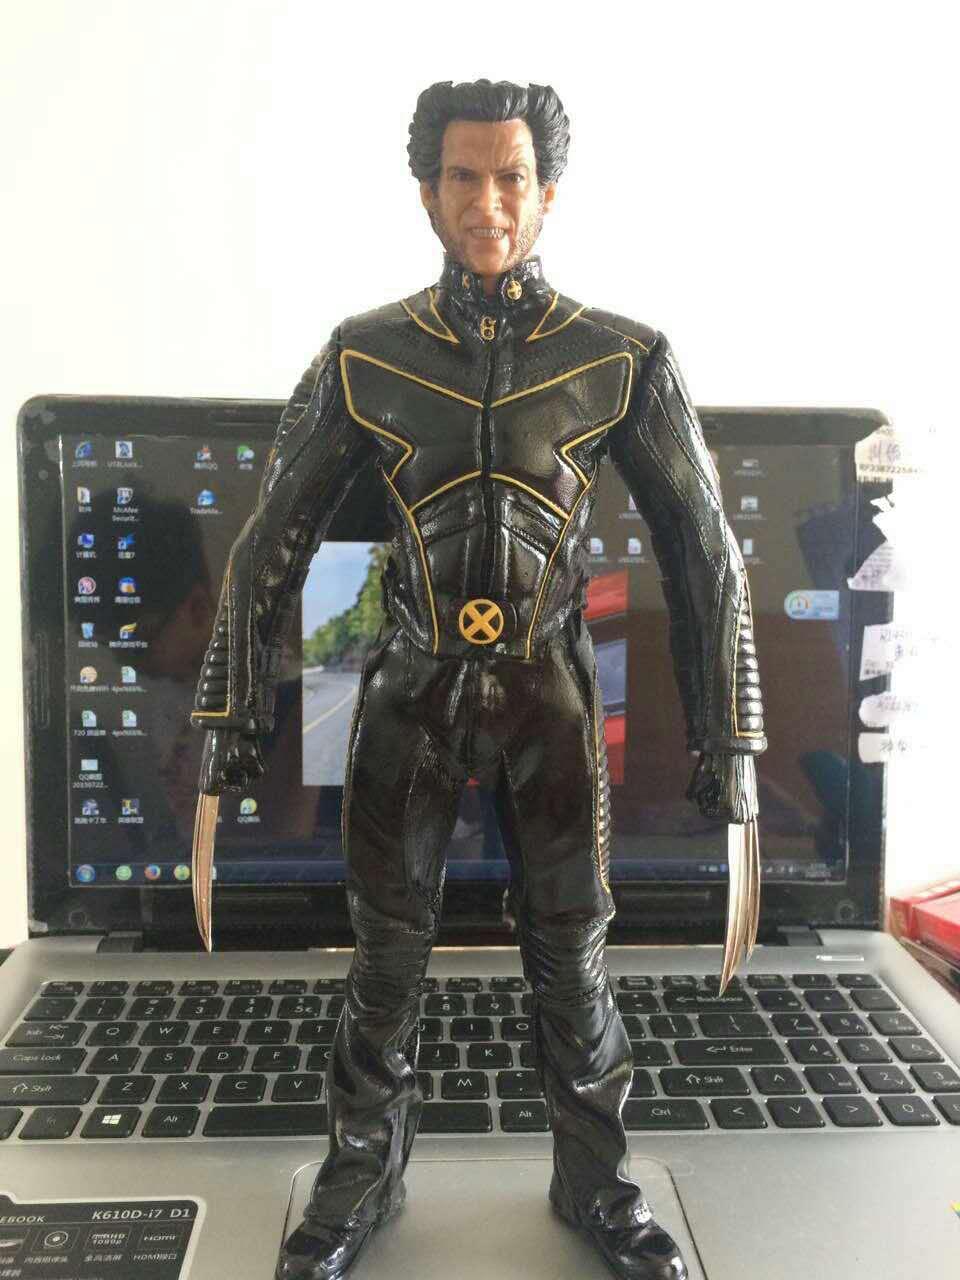 Movie Figure 29 CM Comics X-Men The Last Stand Logan Wolverine PVC Action Figure Kids Gift Model Collectibles Toys<br><br>Aliexpress